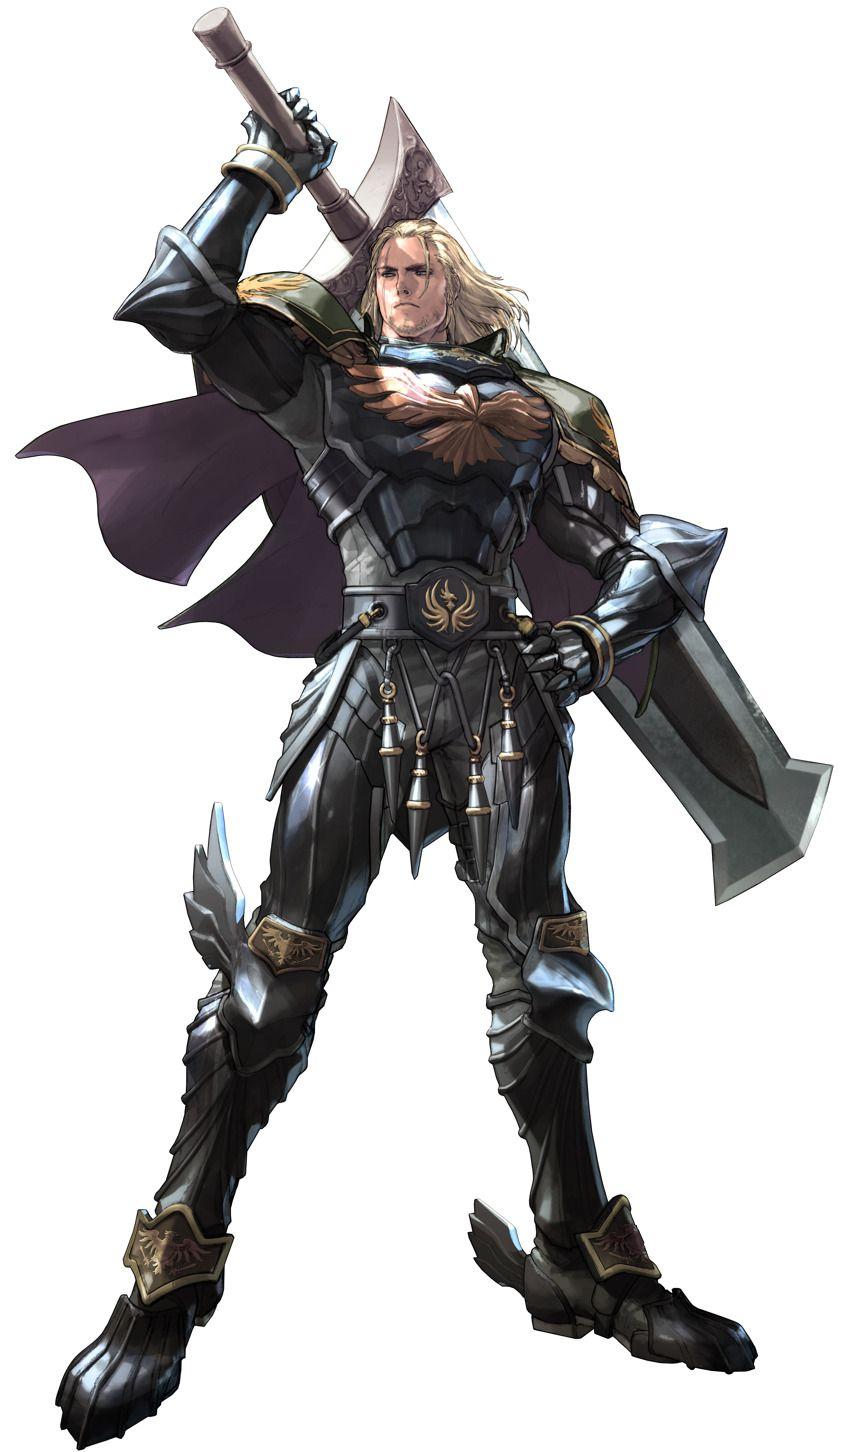 Gauntlet Of Siegfried : gauntlet, siegfried, Greaves, Armor, Blonde_hair, Breastplate, Facial_hair, Full_armor, Gauntlets, Calibur, Characters,, Calibur,, Soulcalibur